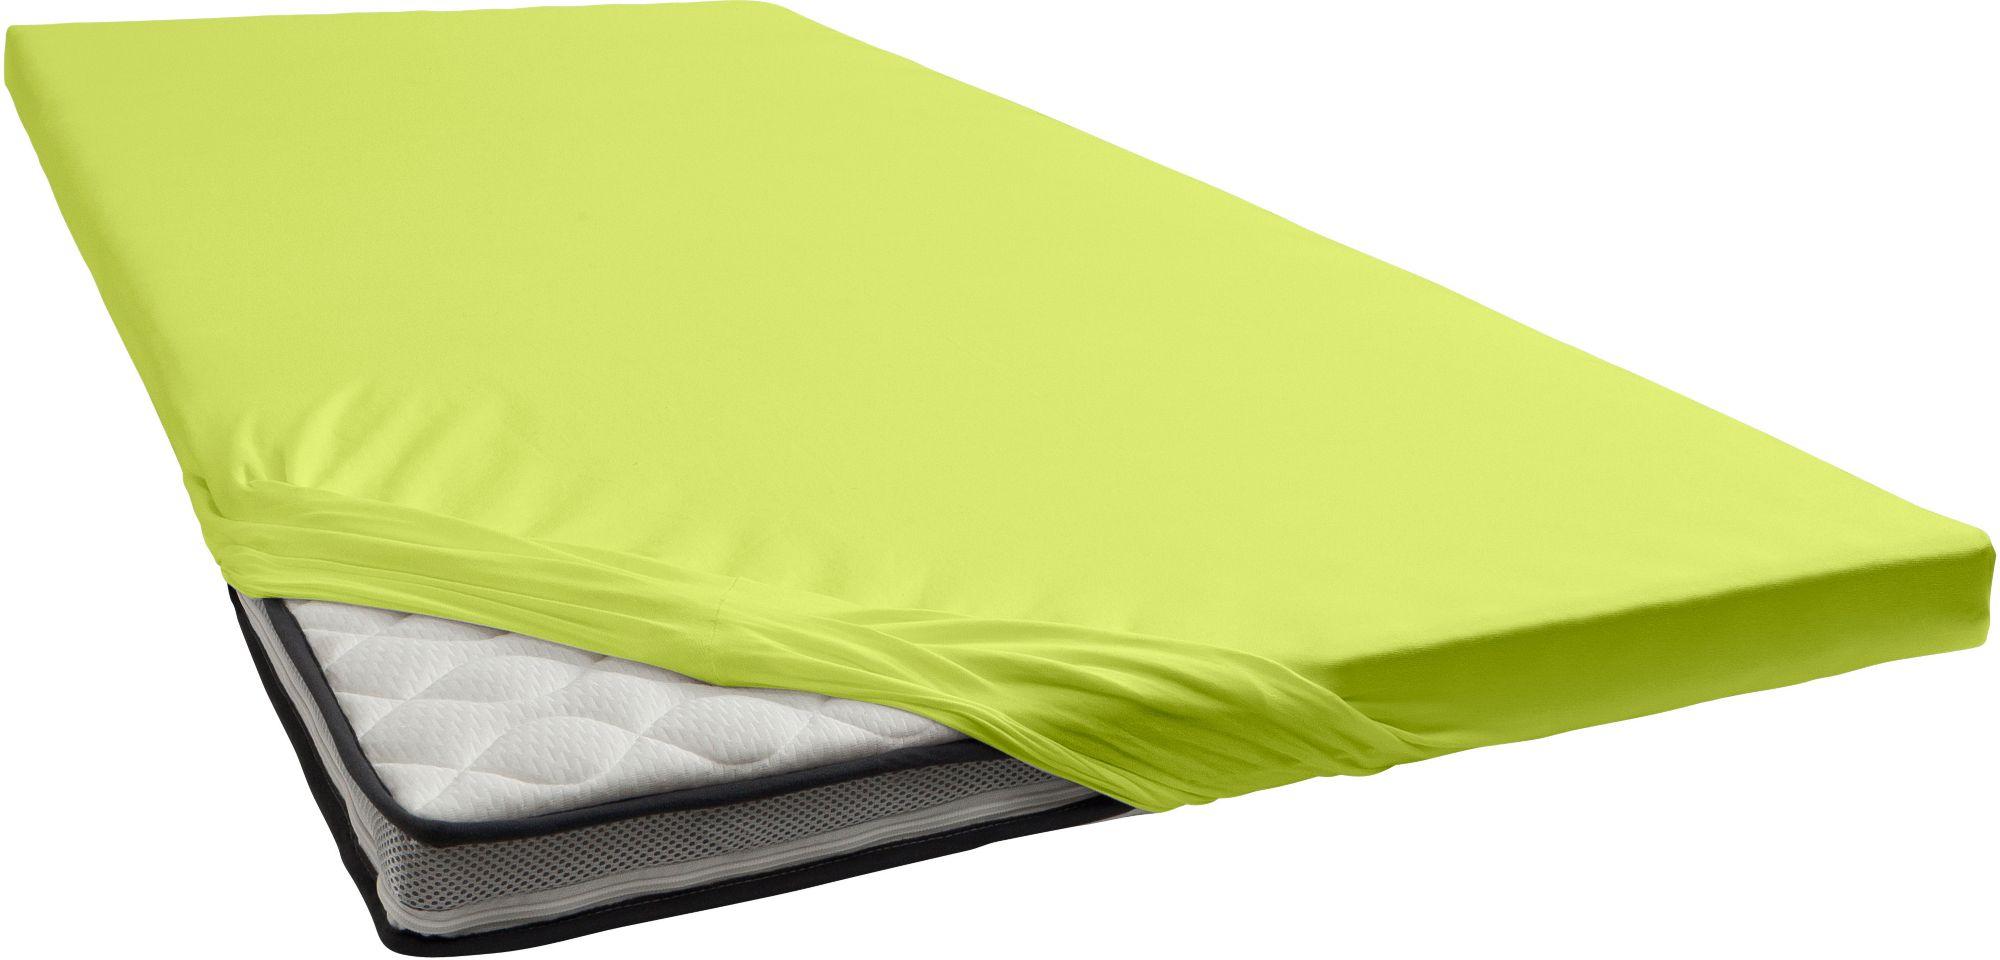 spannbettlaken damai renforc f r topper schwab versand bettlaken. Black Bedroom Furniture Sets. Home Design Ideas